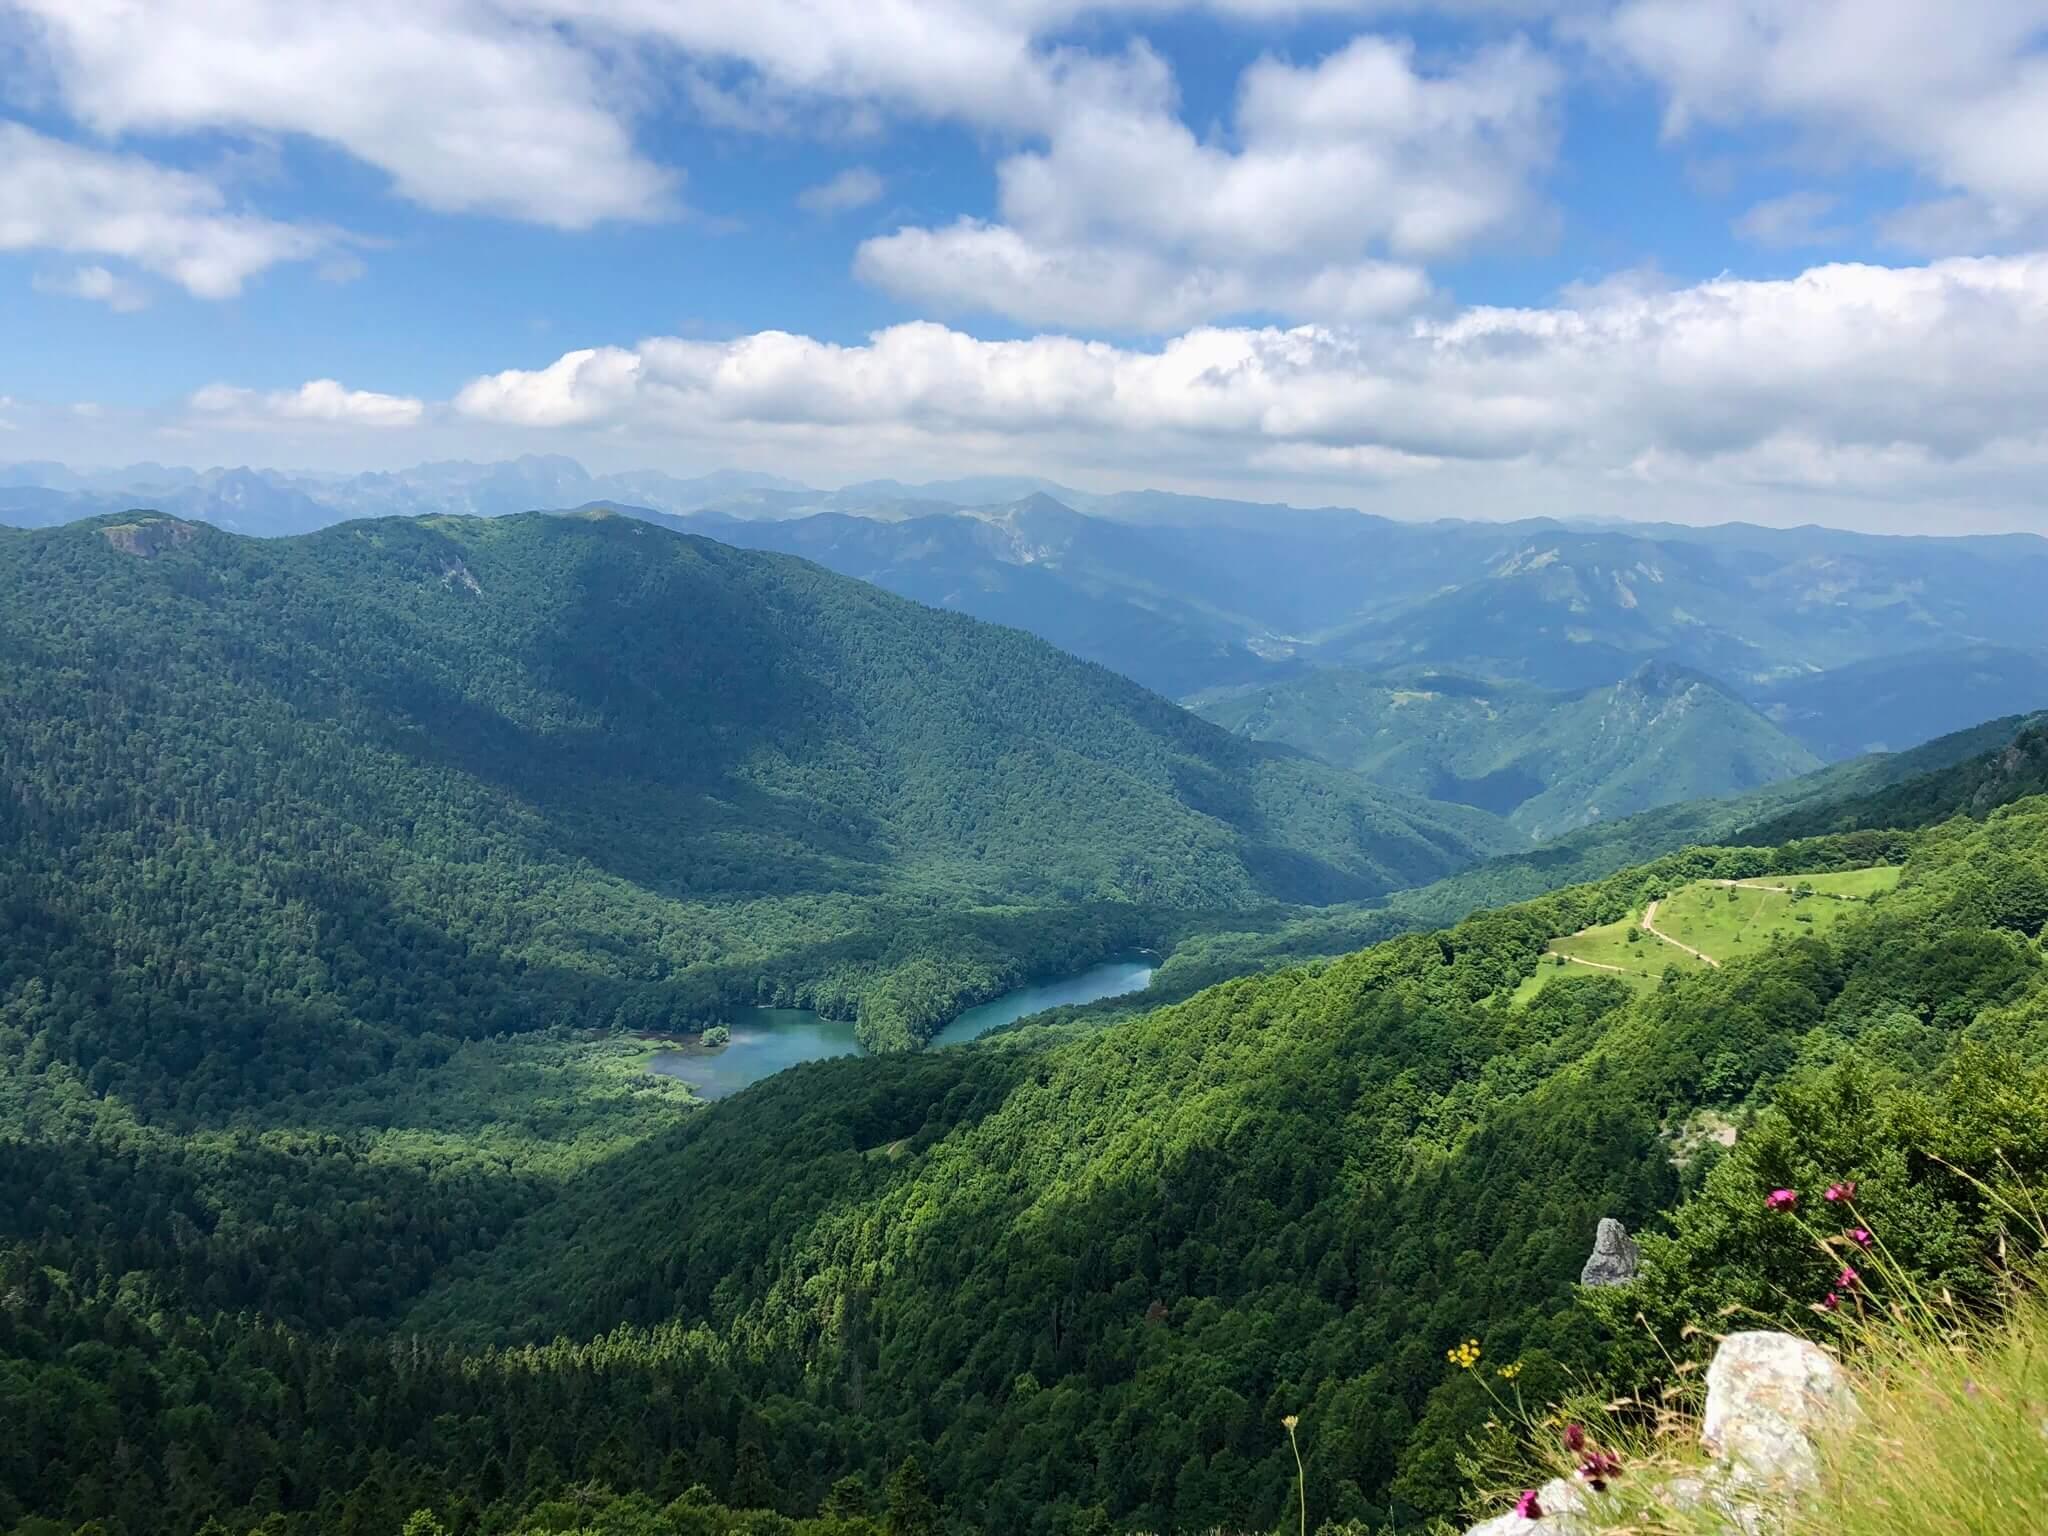 Ausblick über grüne Berge und Seen bei leicht bewölktem Himmel